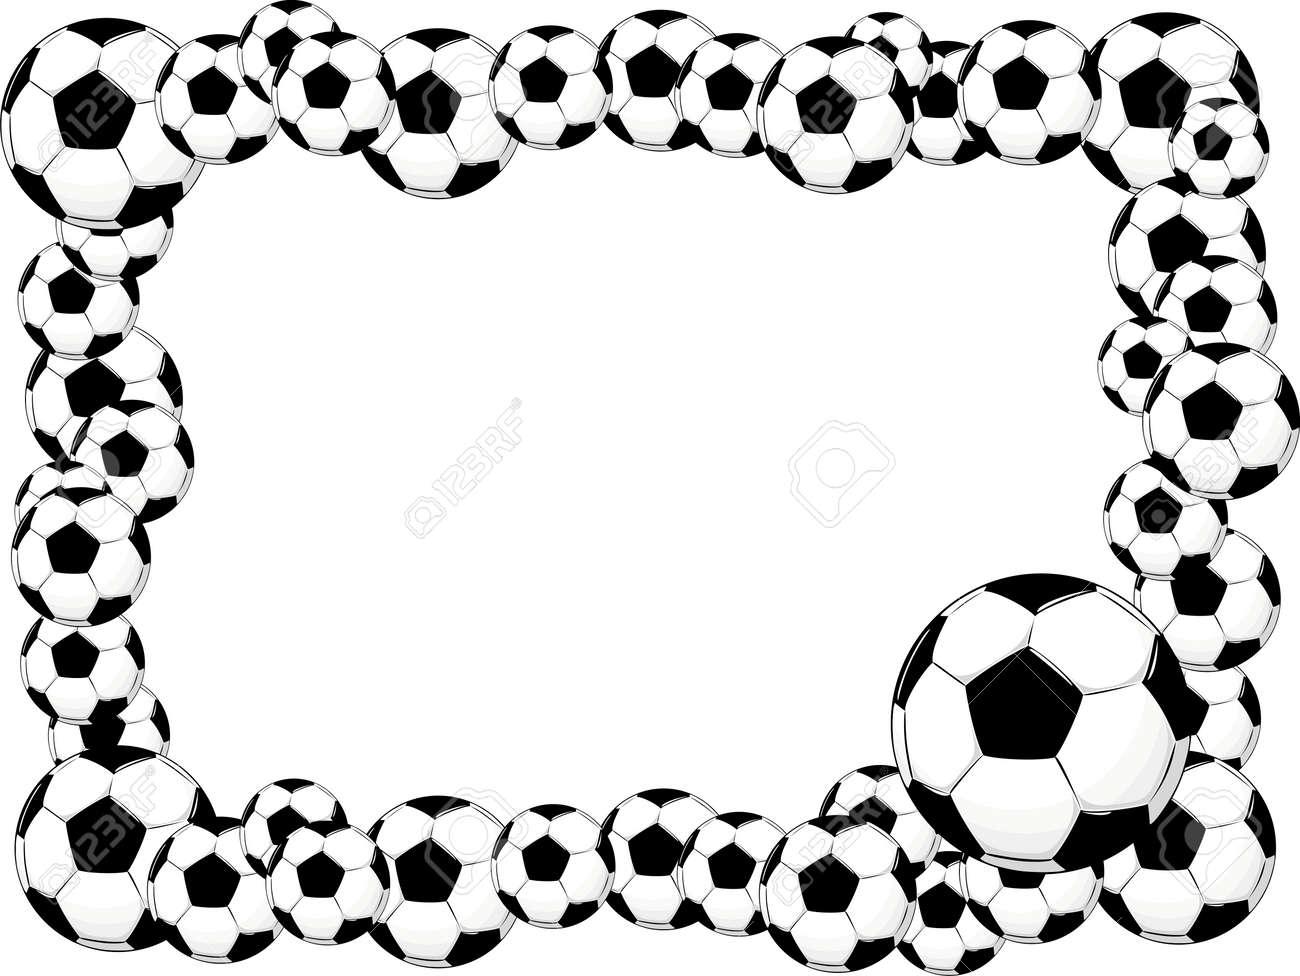 a6ff3266b53 soccer balls frame Stock Vector - 5194465